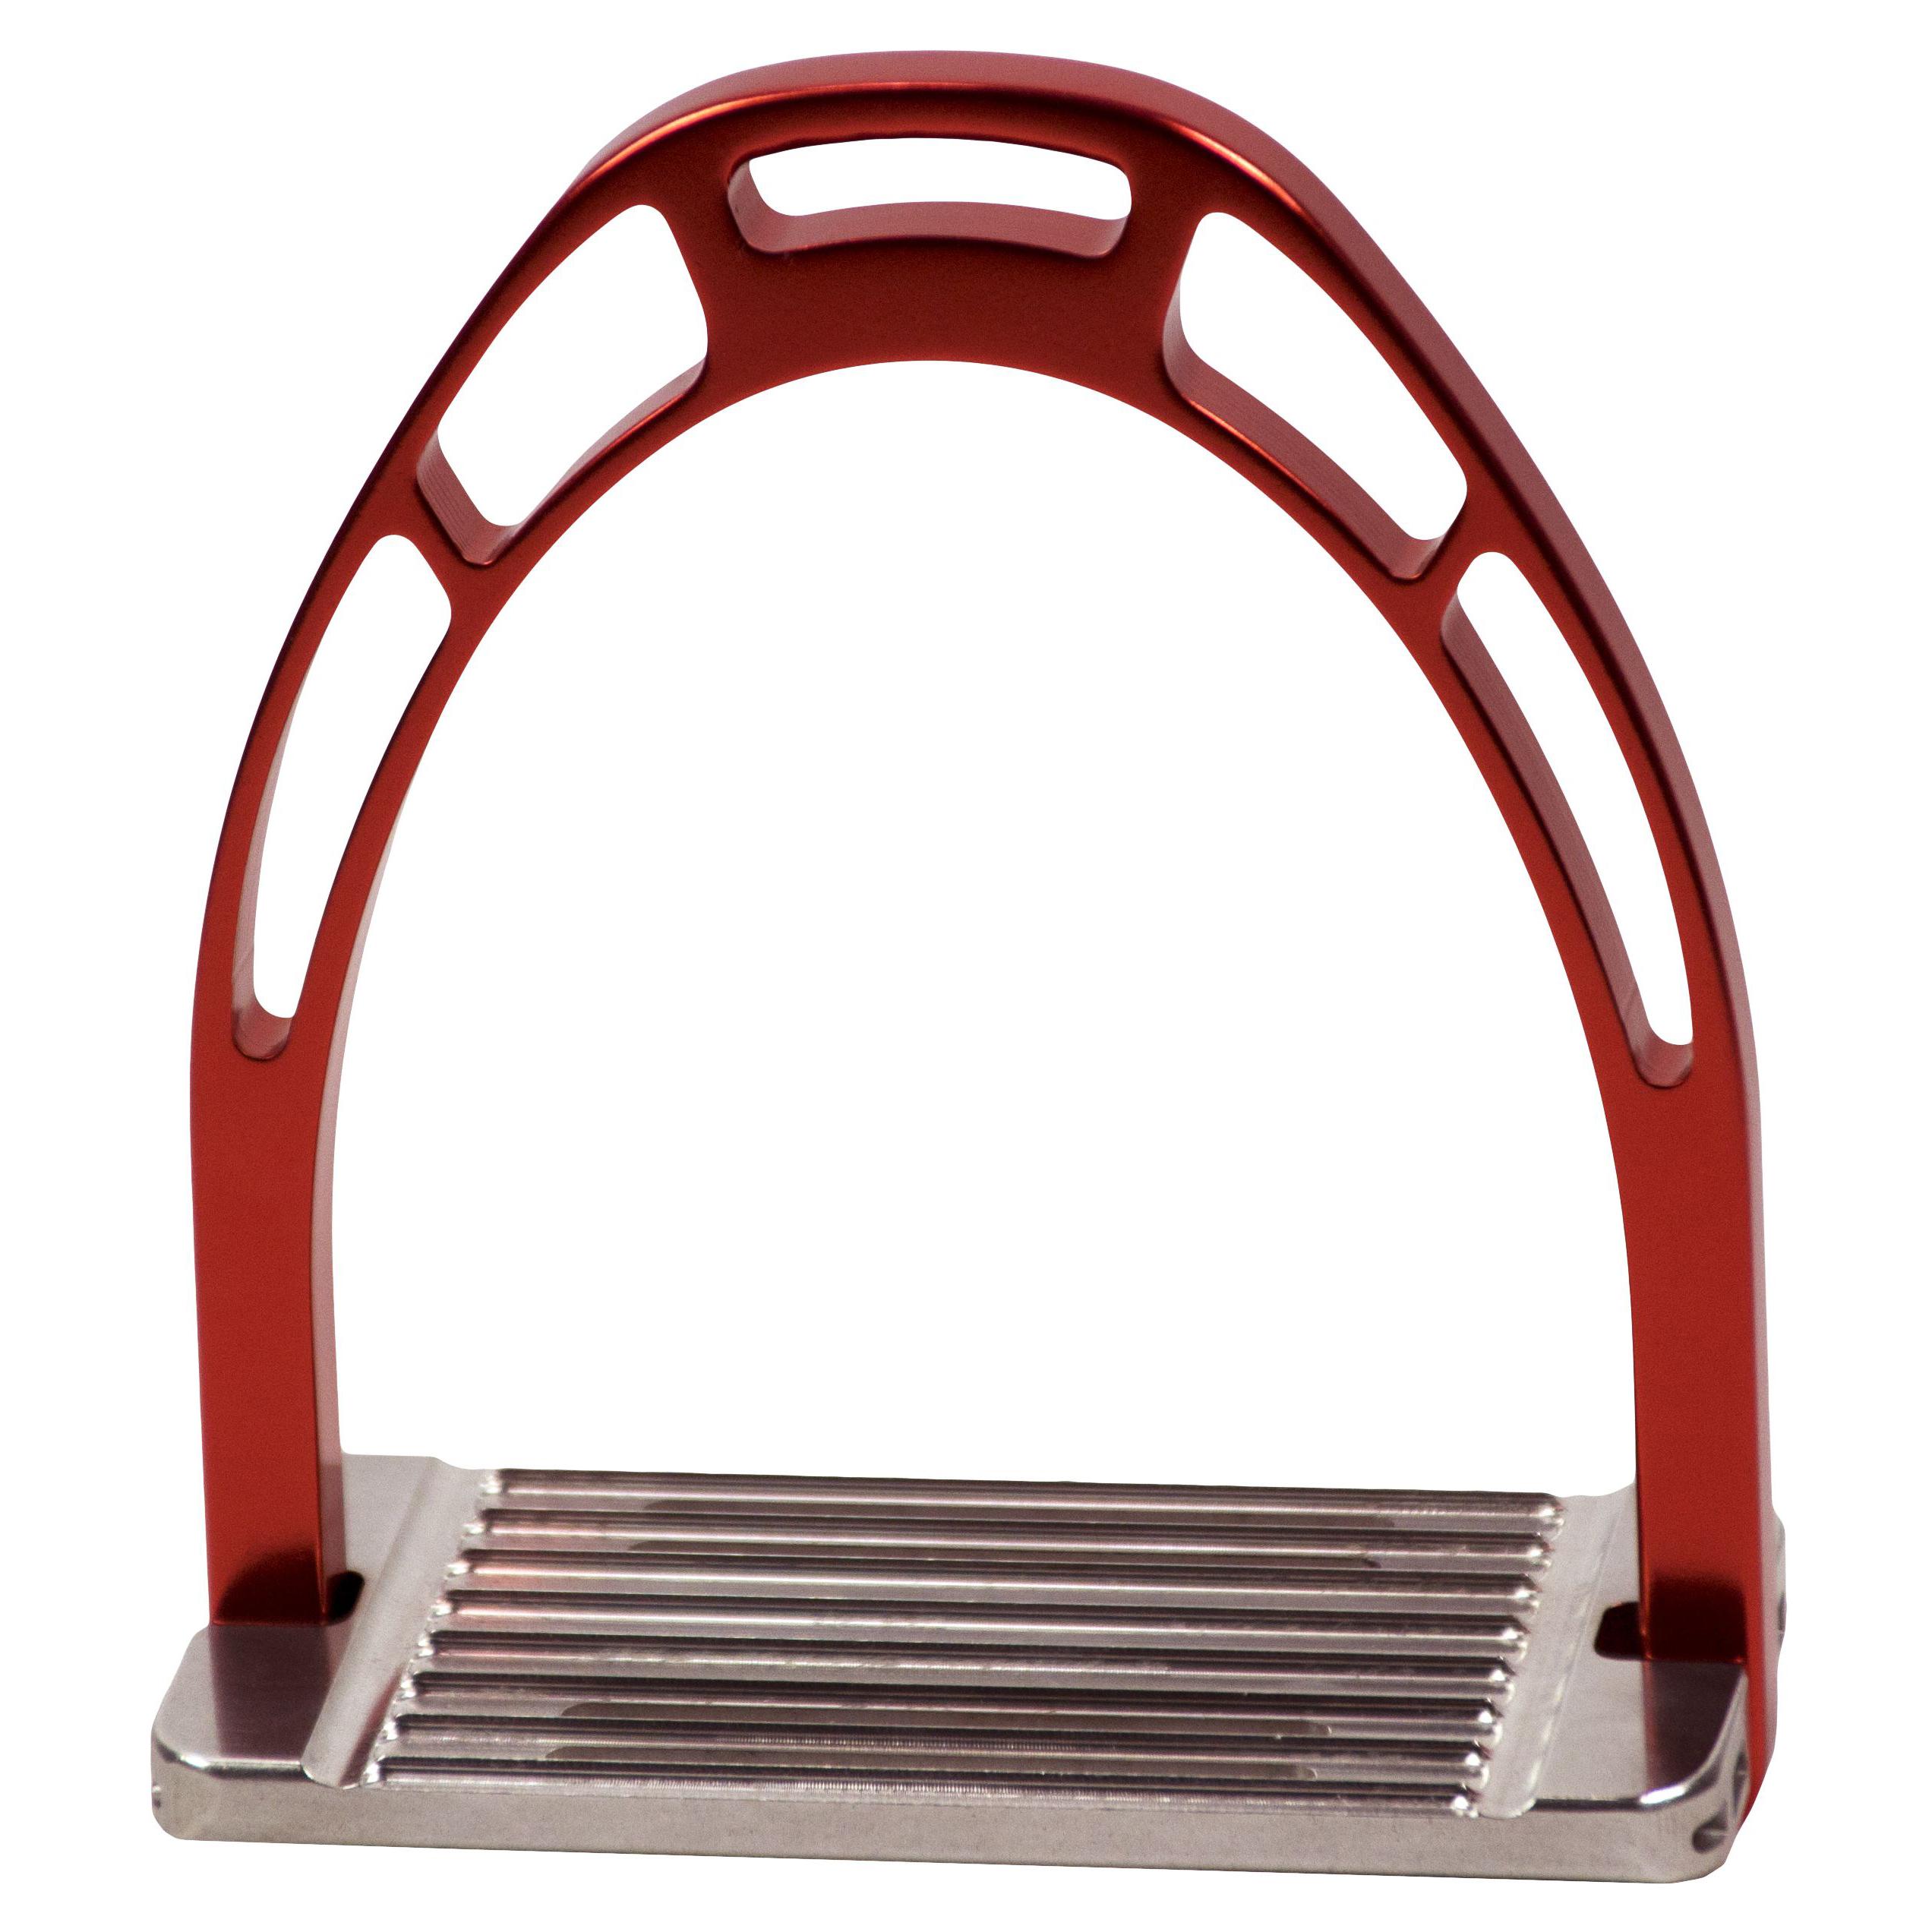 ACAVALLO - Steigbügel Arco Alupro, Farbe red